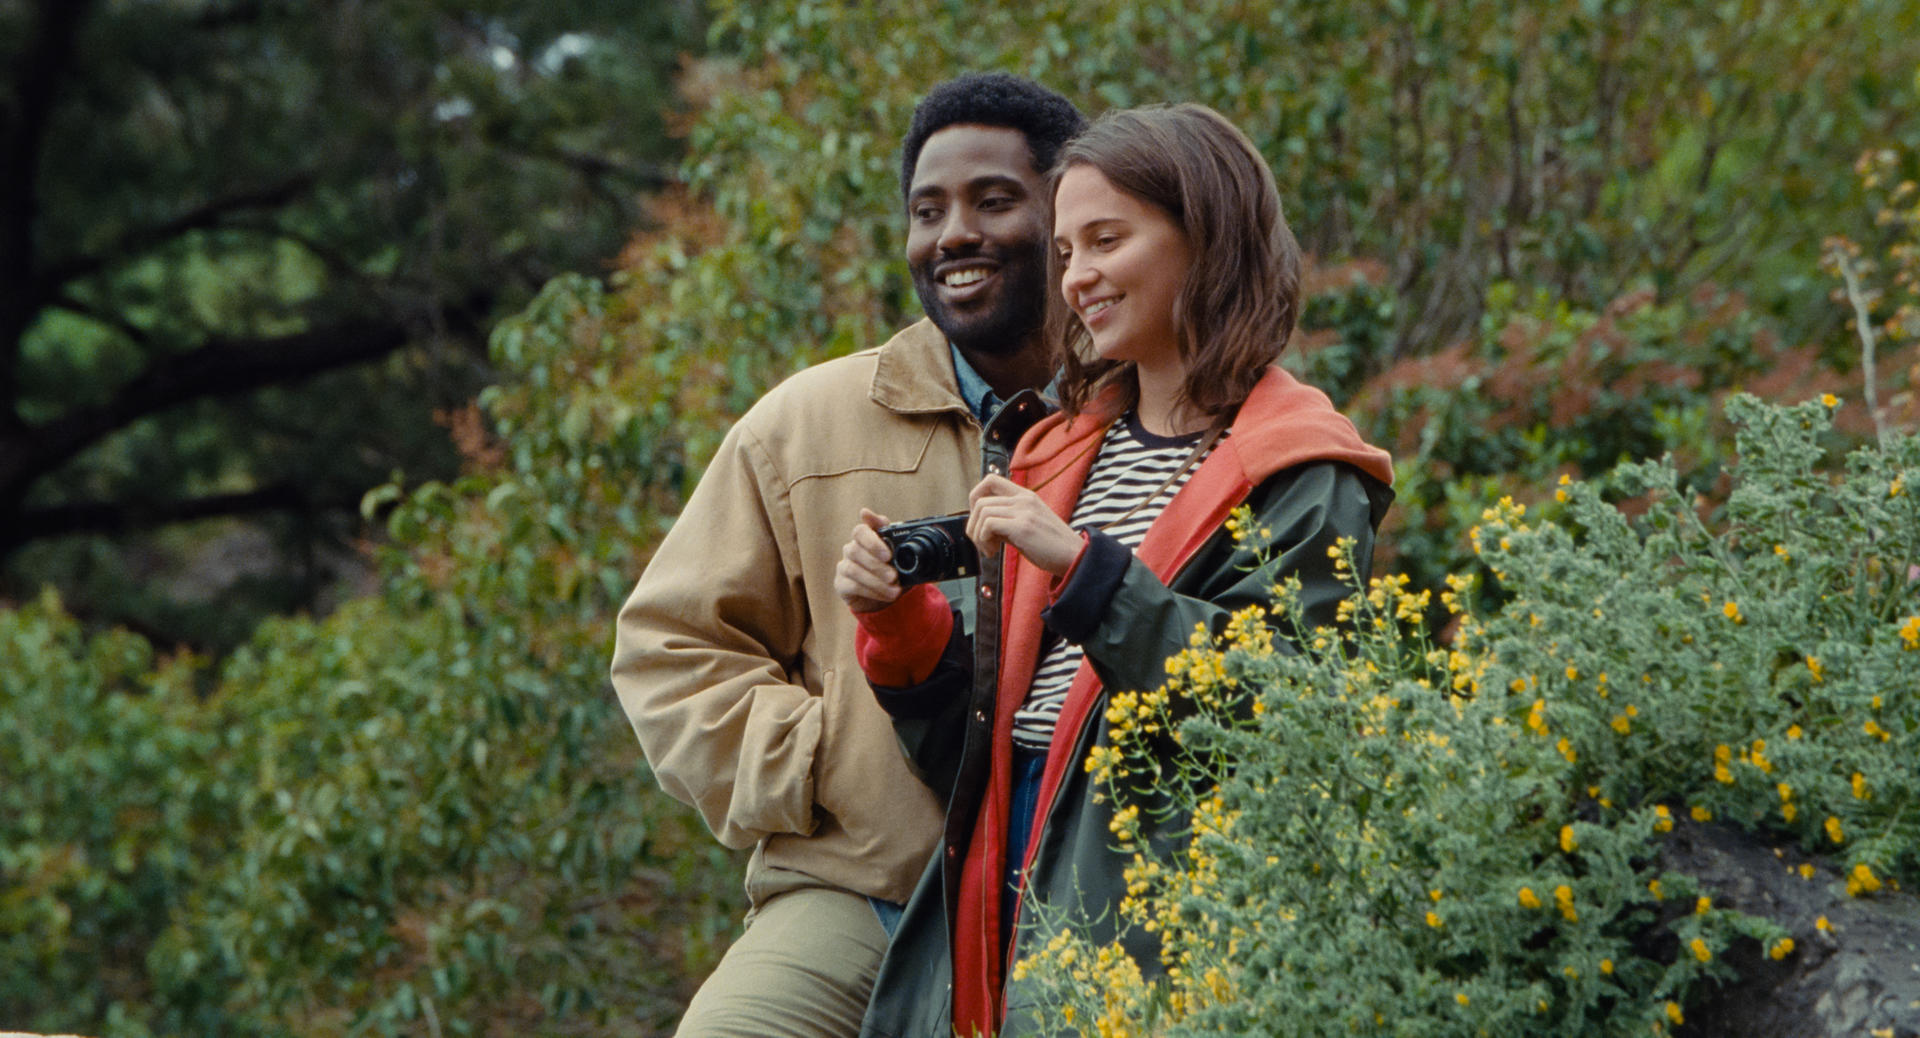 Beckett recensione film Netflix con John David Washington e Alicia Vikander